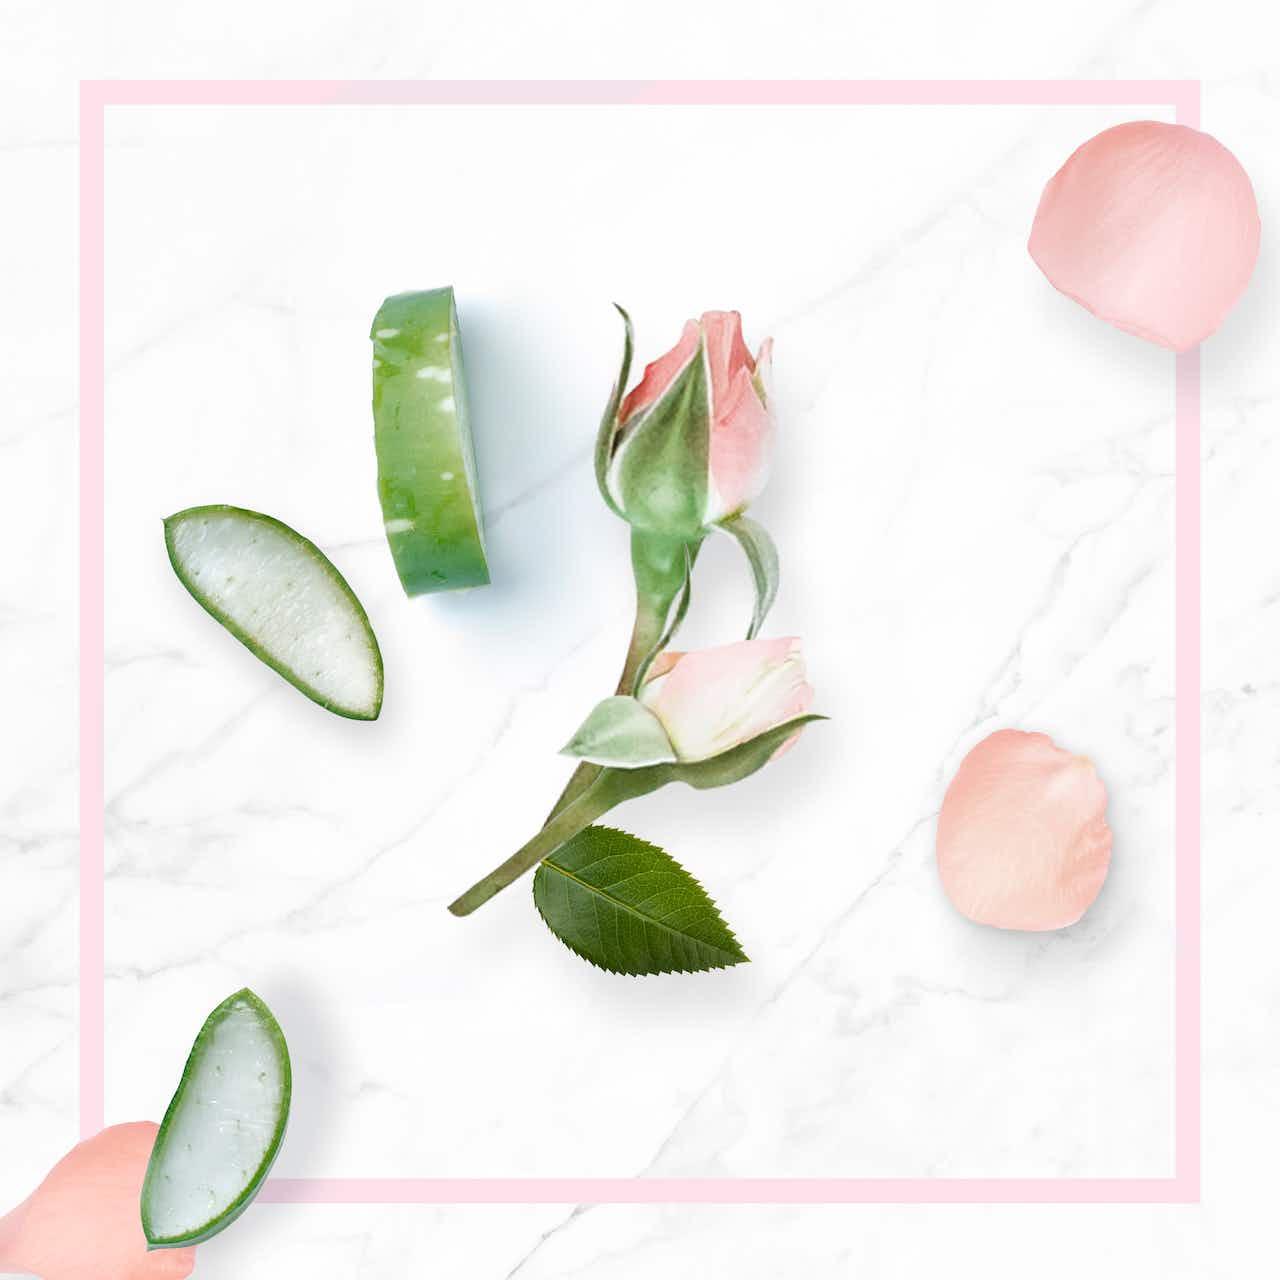 Bio damaszkuszi rózsa és bio aloe vera